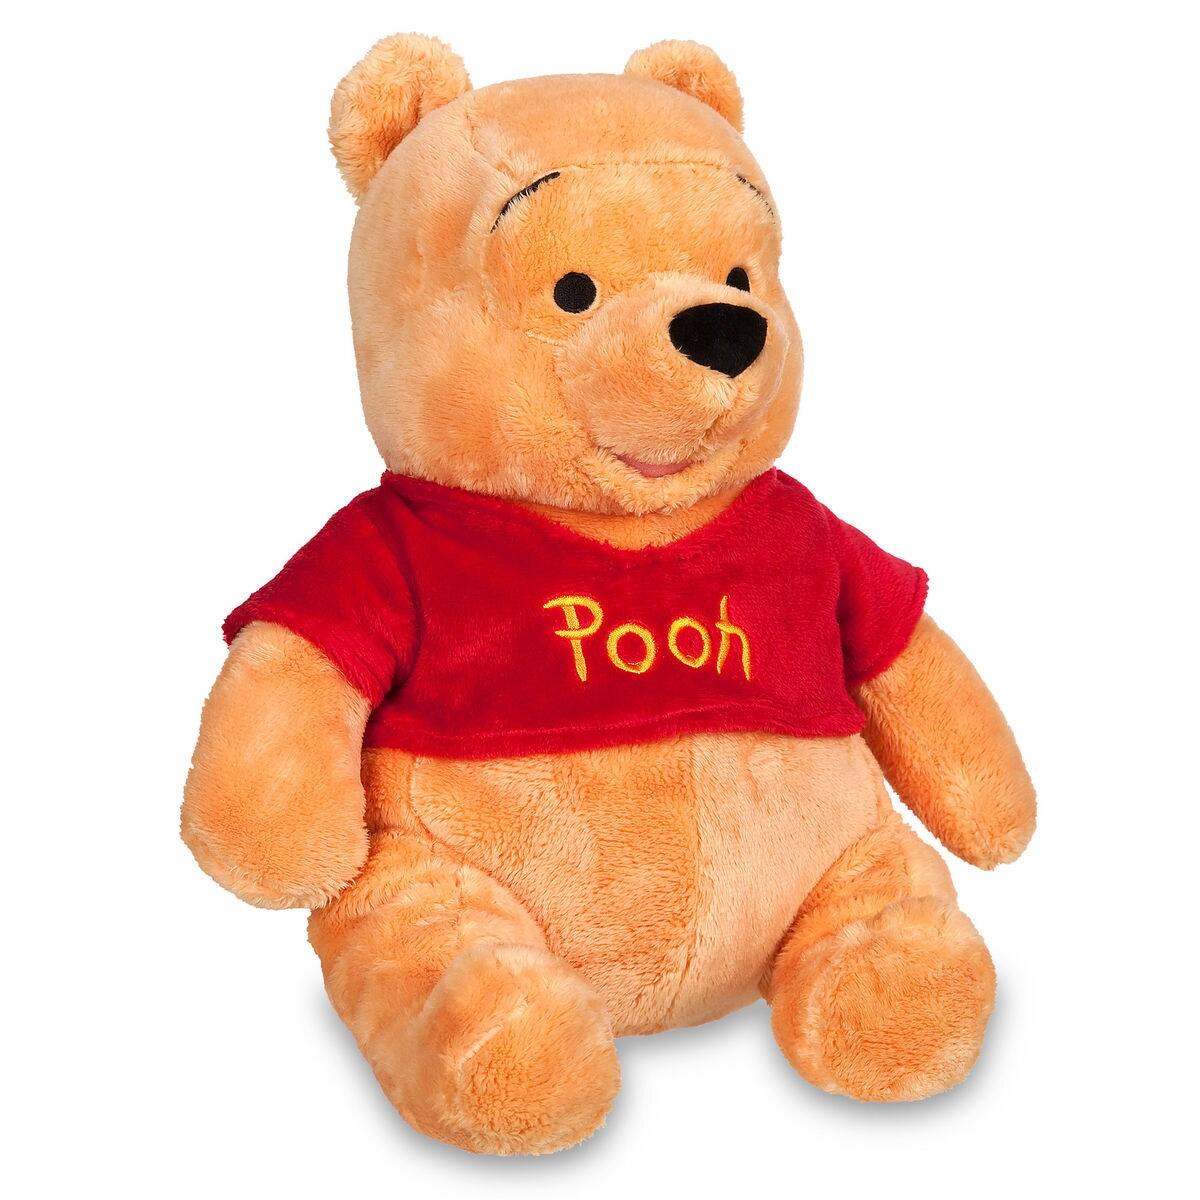 Winnie The Pooh Plush Medium 14 Shopdisney